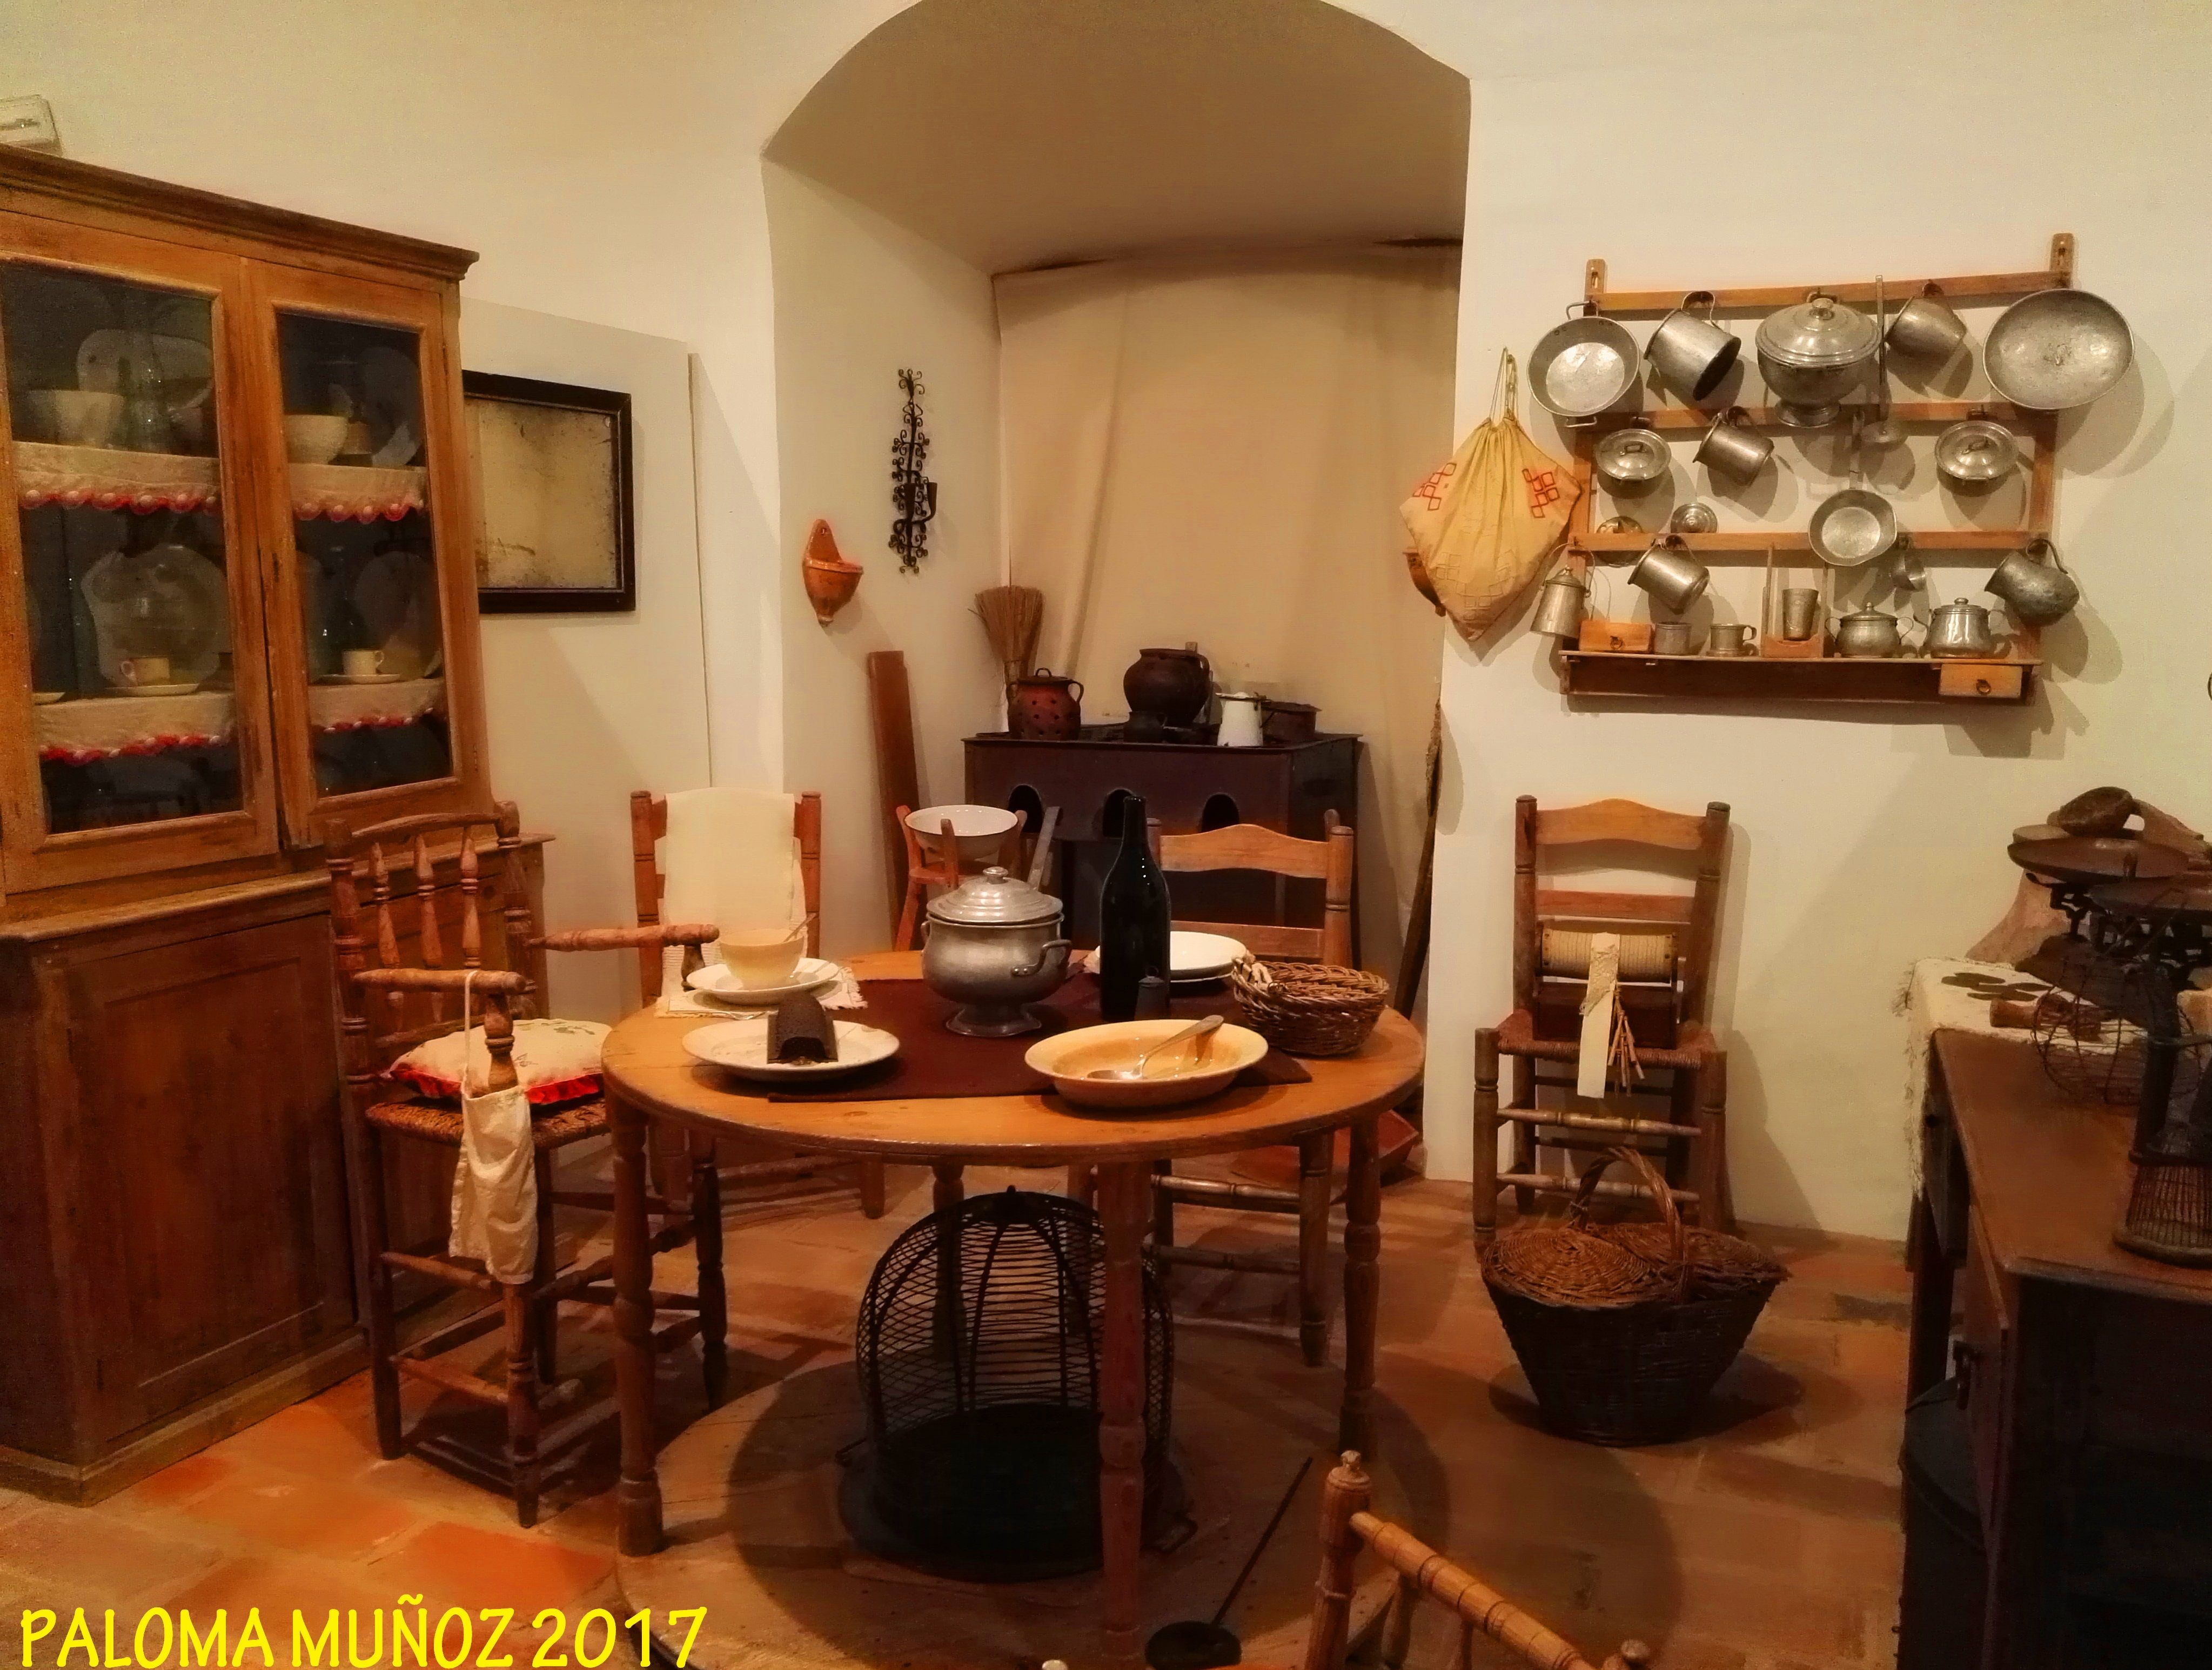 Cocina R Stica Sencilla Mesa Con Calentador O Estufa De Hierro  # Muebles Gil Alburquerque